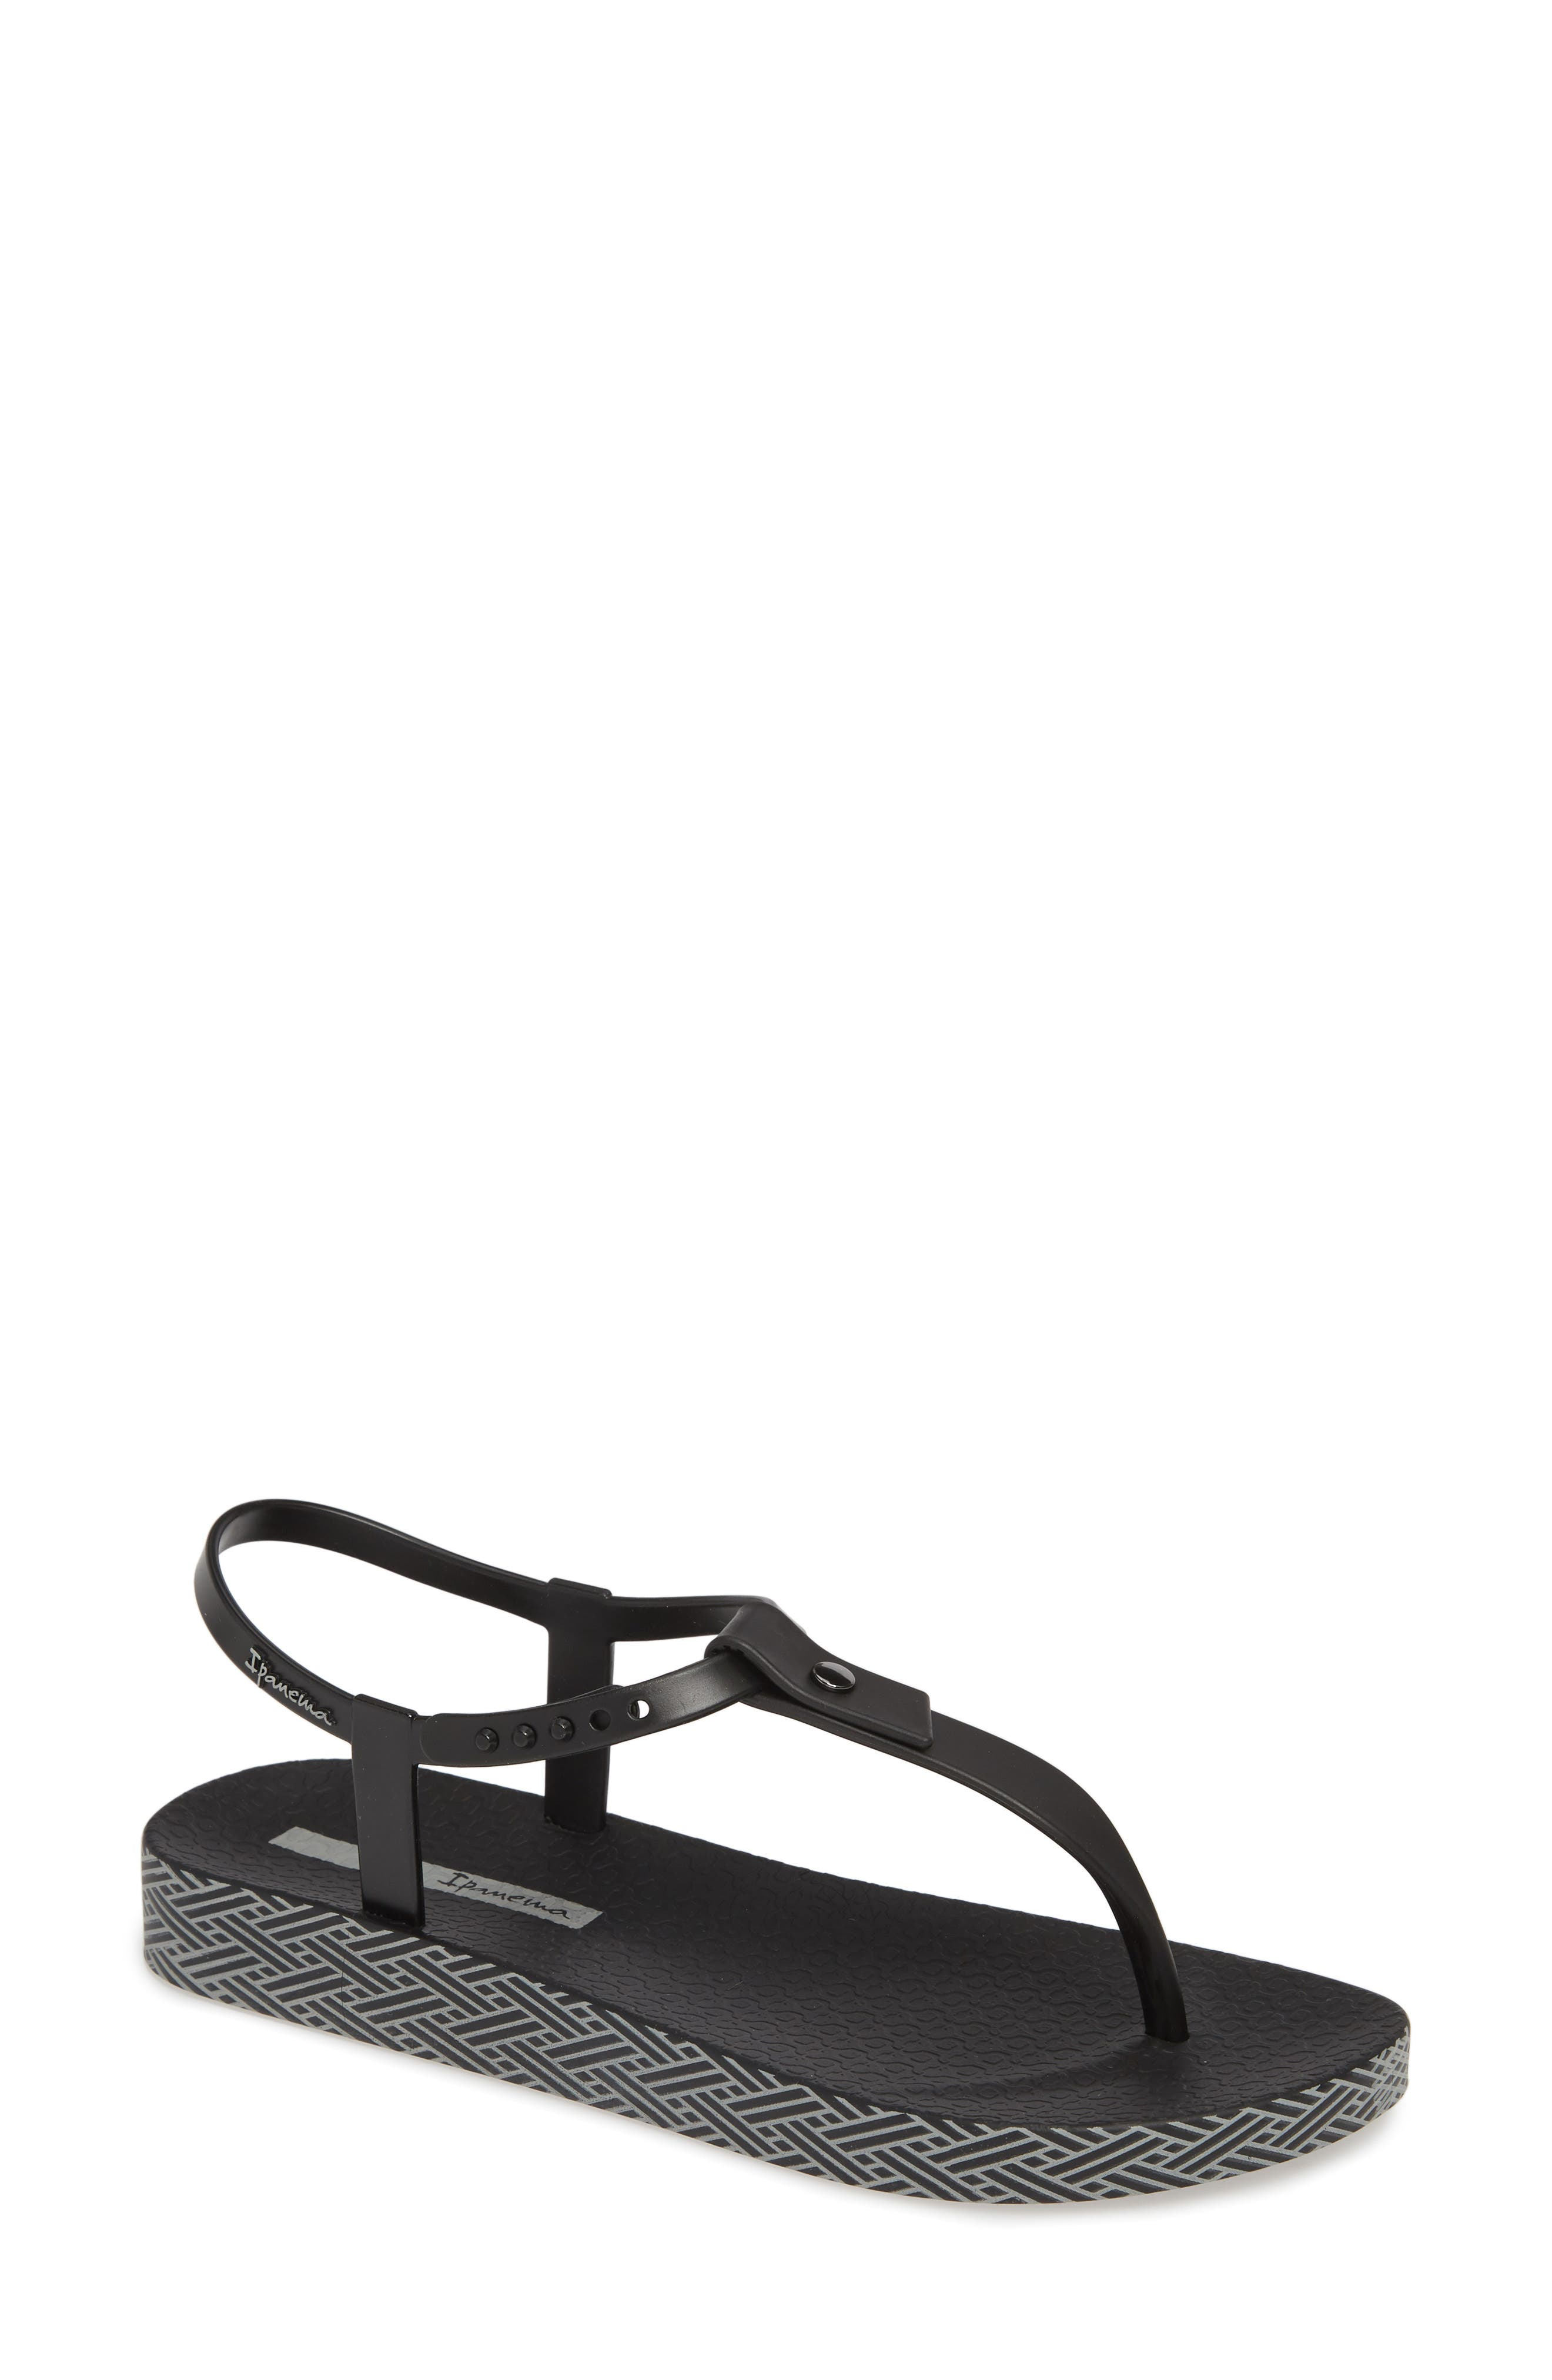 IPANEMA Plush Weave T-Strap Sandal, Main, color, 001